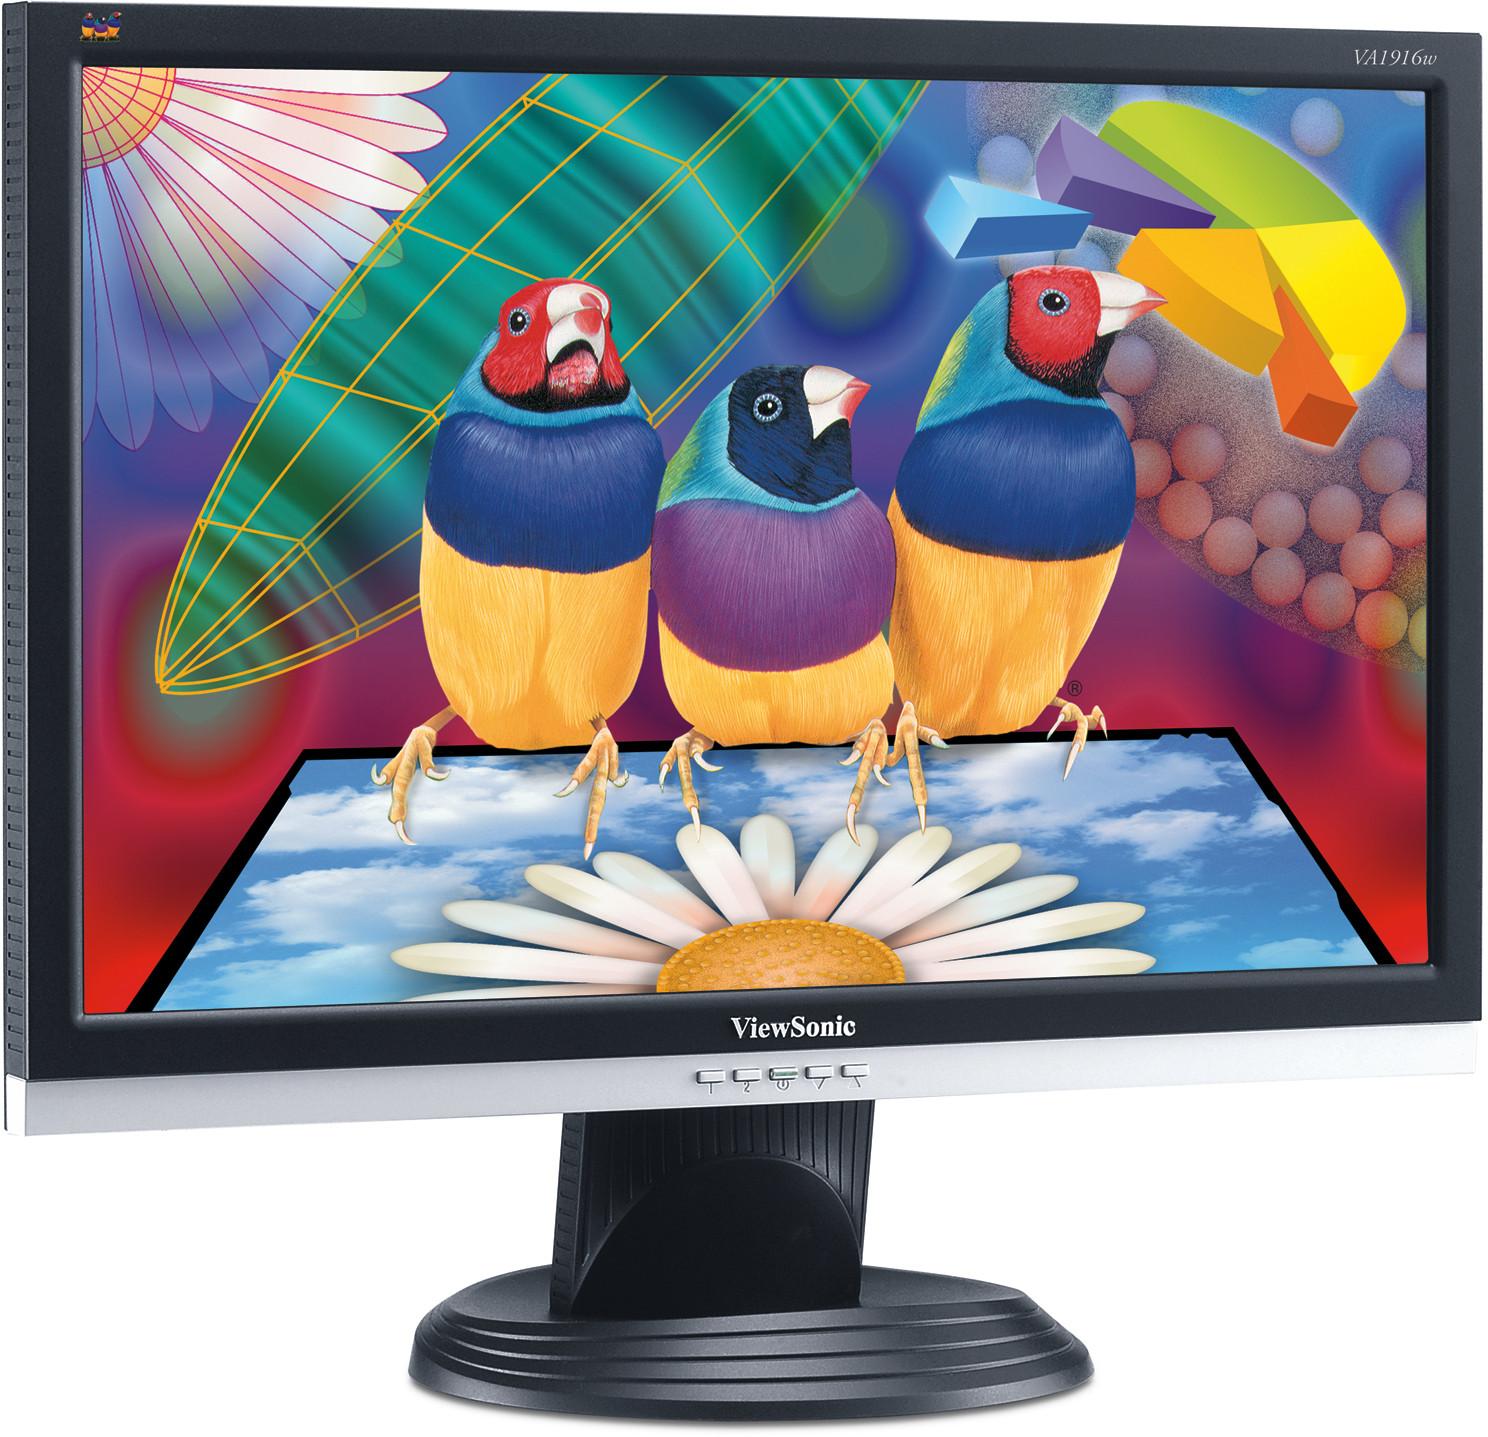 ViewSonic VA20w 20 cm/20 Zoll LCD Breitbildmonitor der VA Serie ...